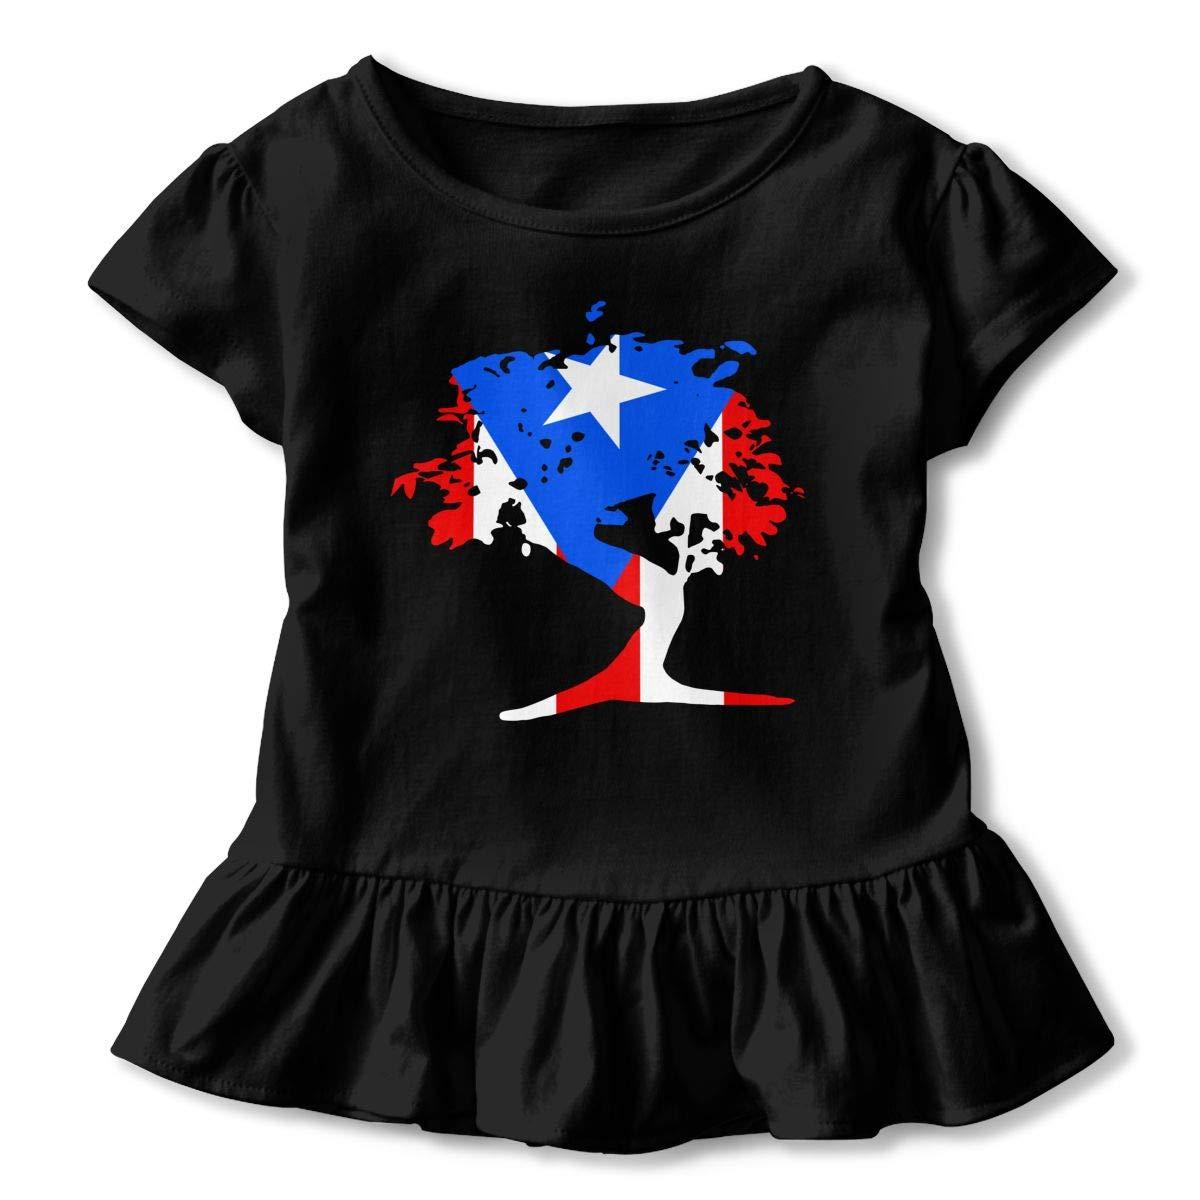 Japanese Bonsai Tree Puerto Rico Kids Girls Short Sleeve Ruffles Shirt T-Shirt for 2-6 Toddlers